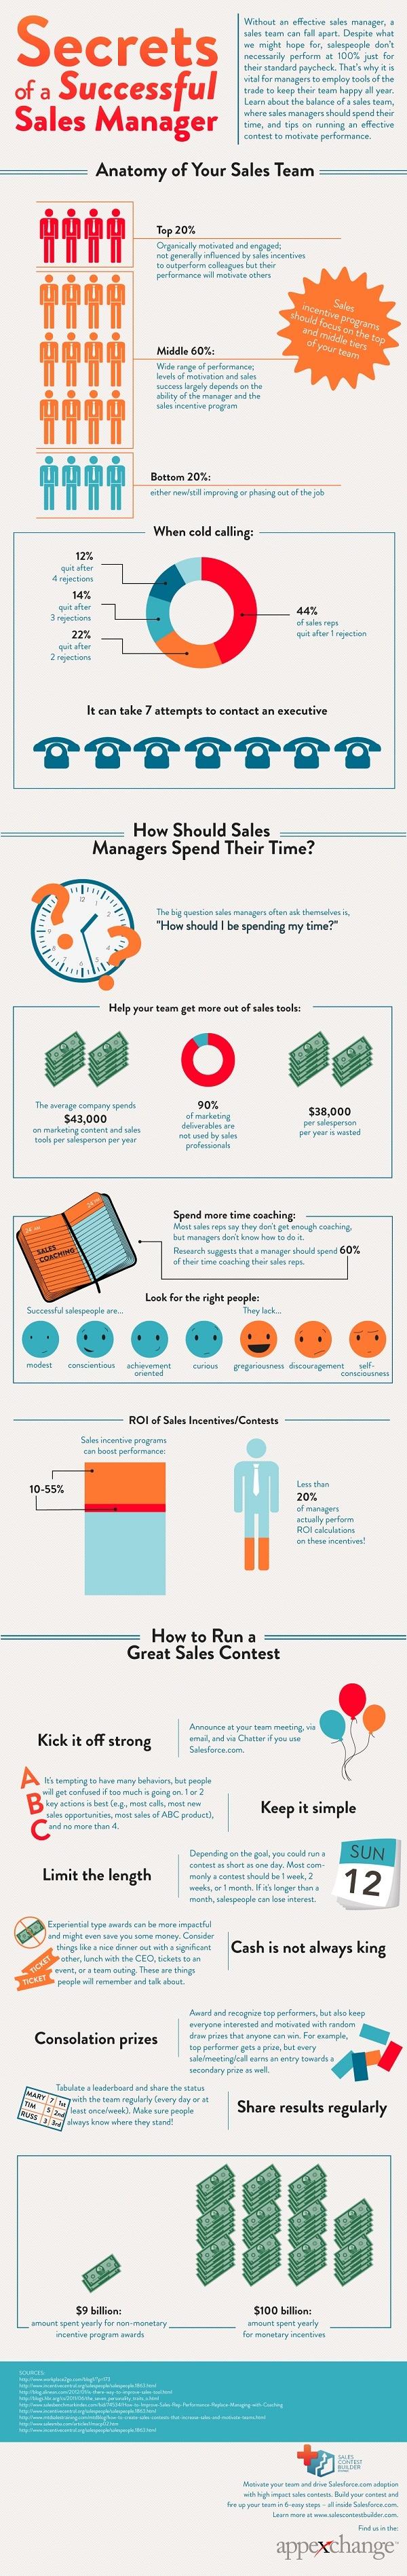 infographic-secretsofsuccessfulsalesmanager_600px-widejpg.jpg